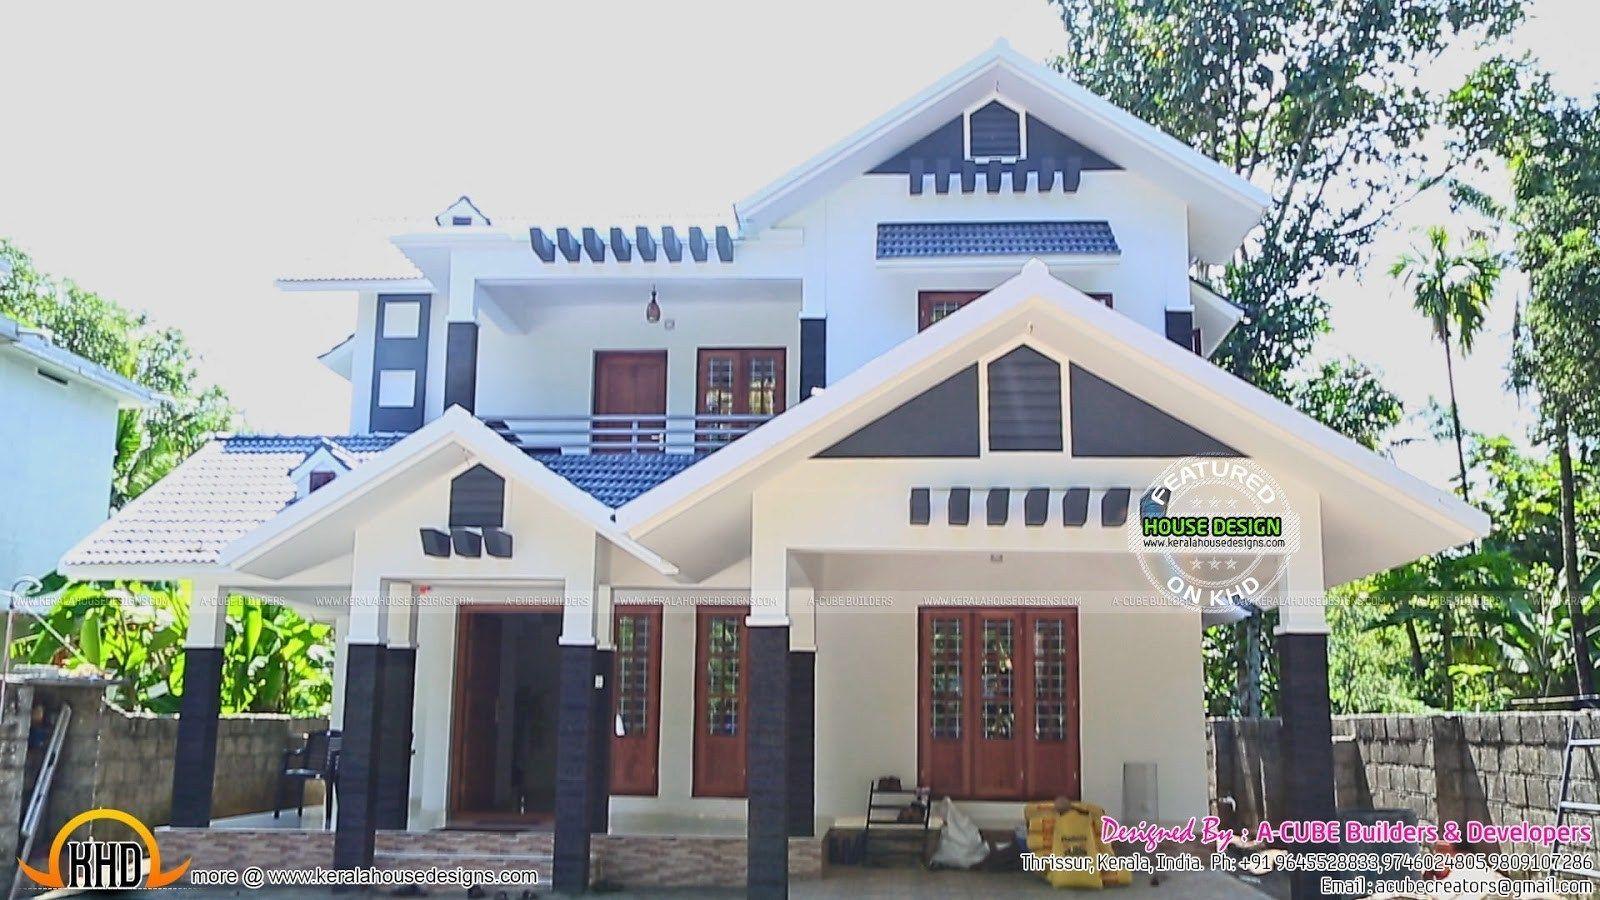 New Home Design Ideas Fresh New Home Design Ideas New Home Design Plans Beautiful House Design Lay Latest House Designs Kerala House Design New House Plans